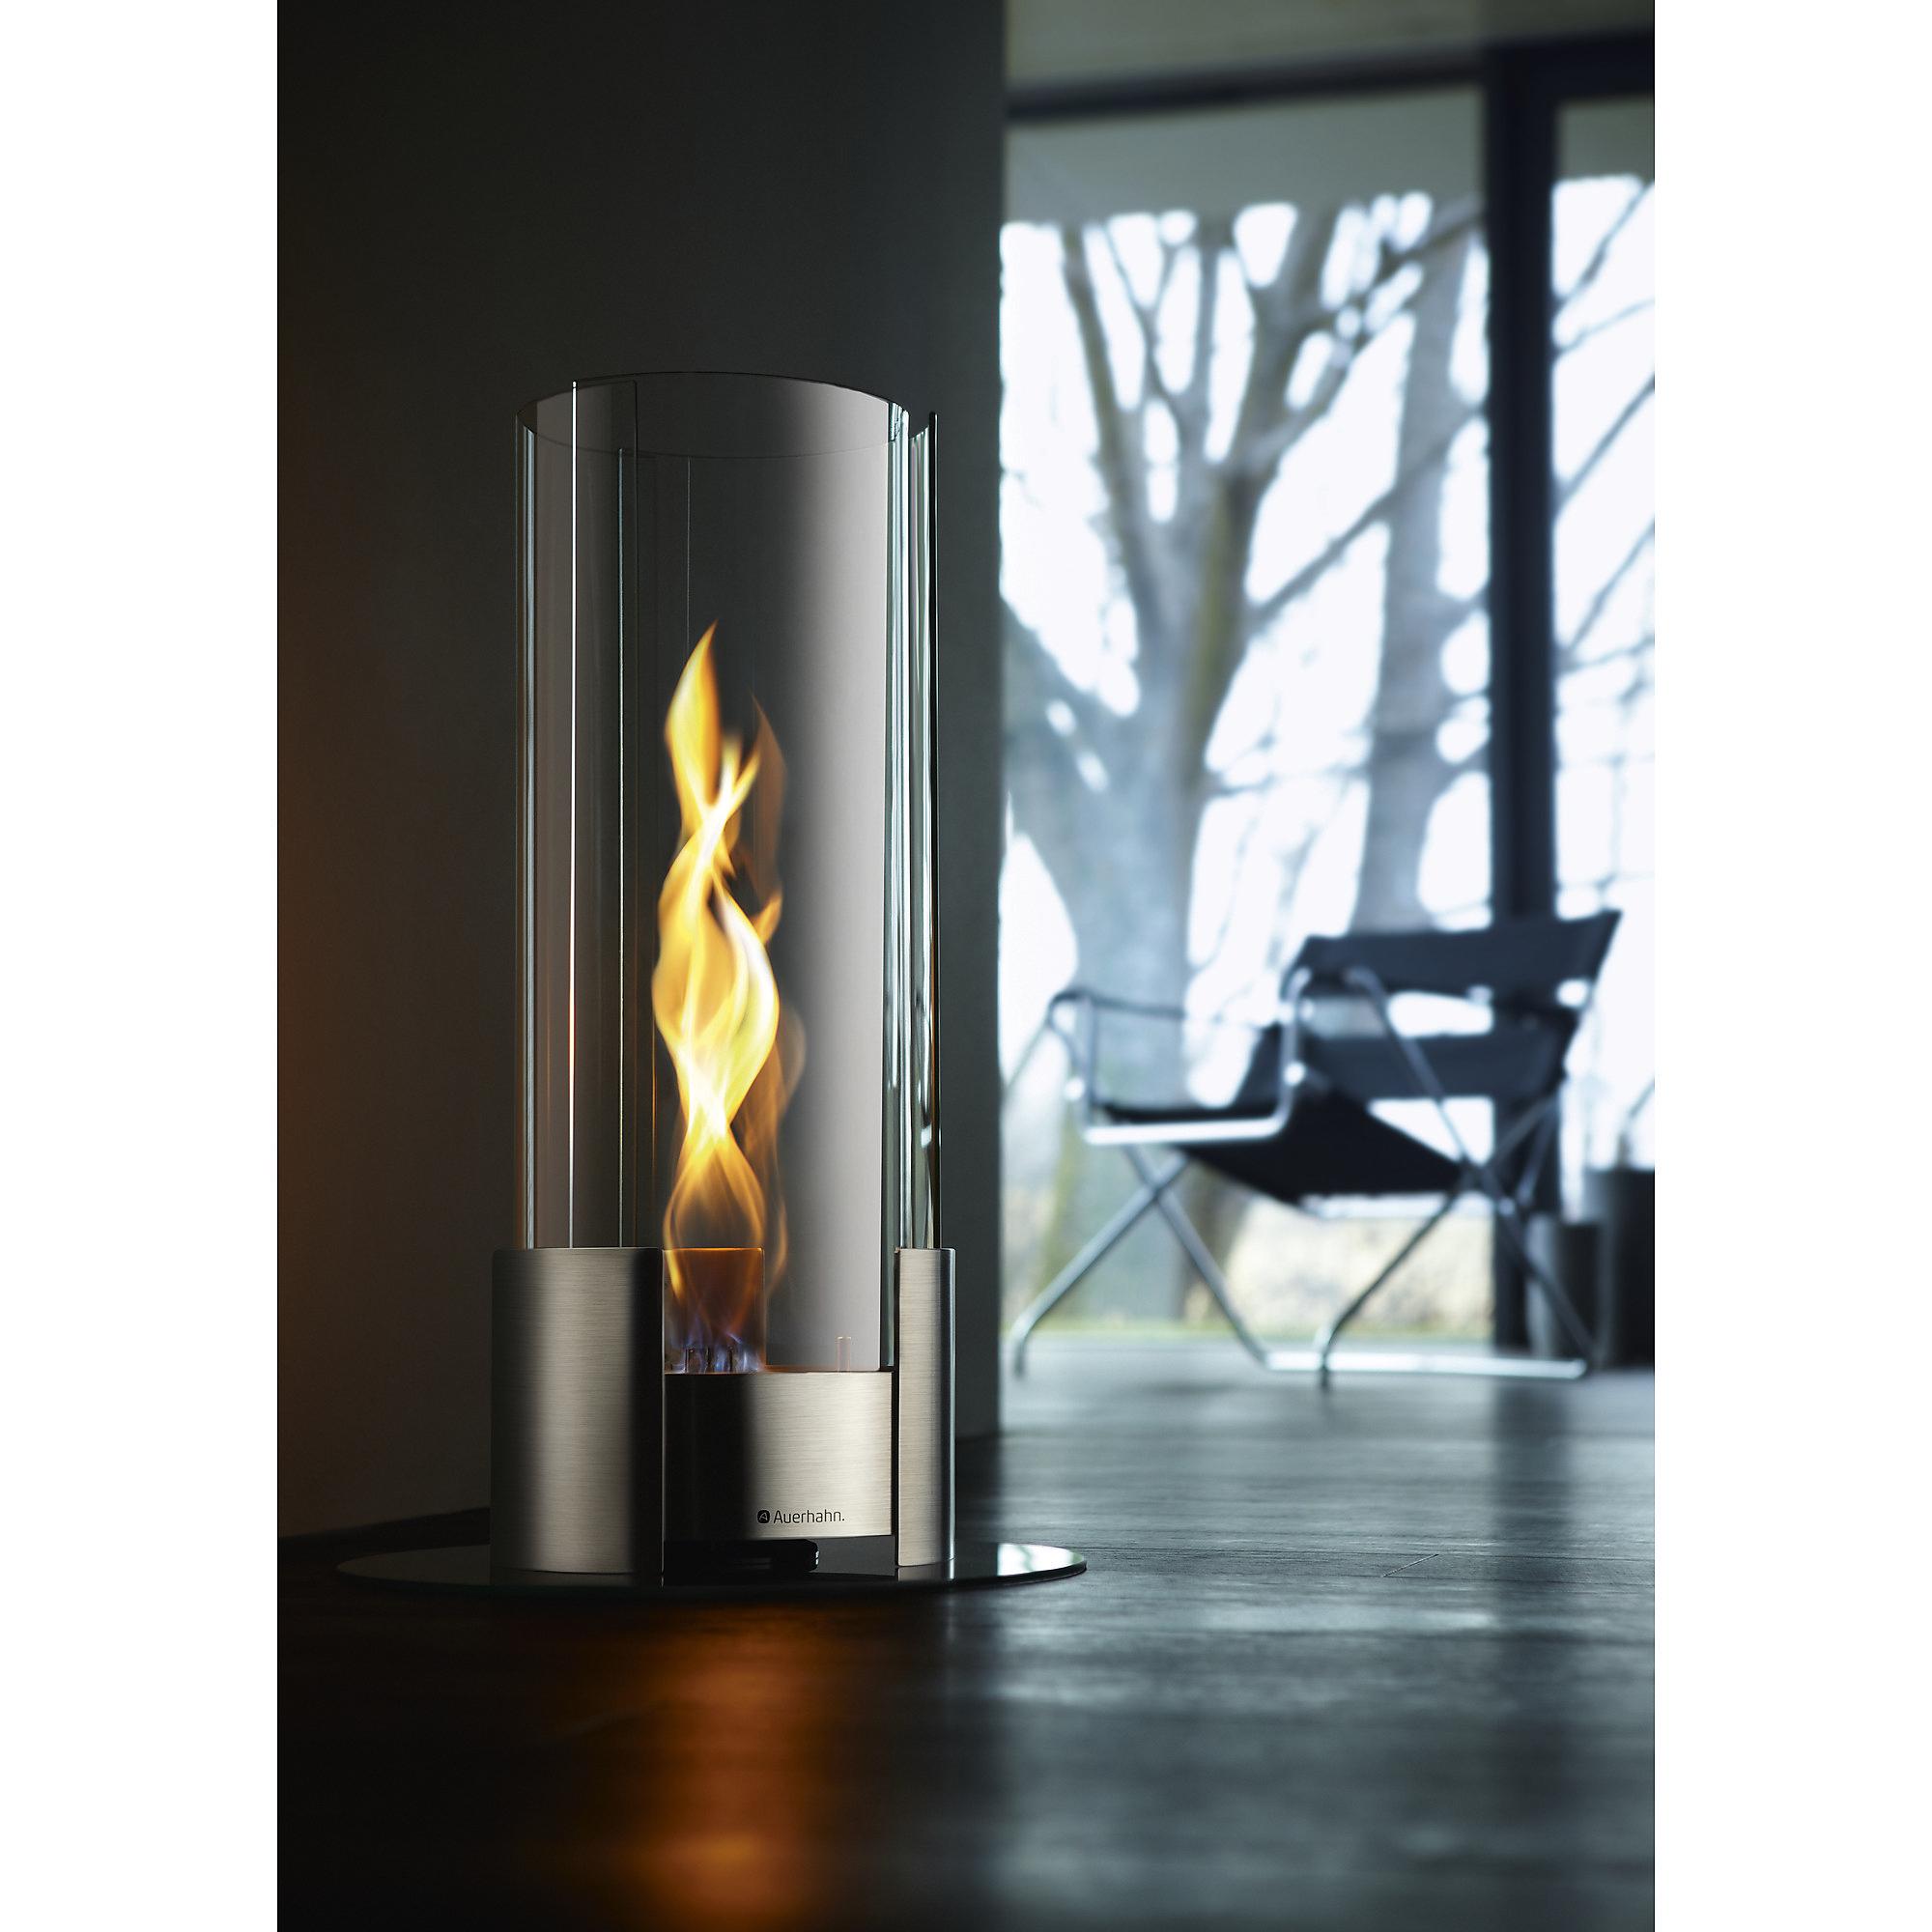 auerhahn 24 3012 2070 twistfire new generation l h he ca 63 cm h133 4 ebay. Black Bedroom Furniture Sets. Home Design Ideas